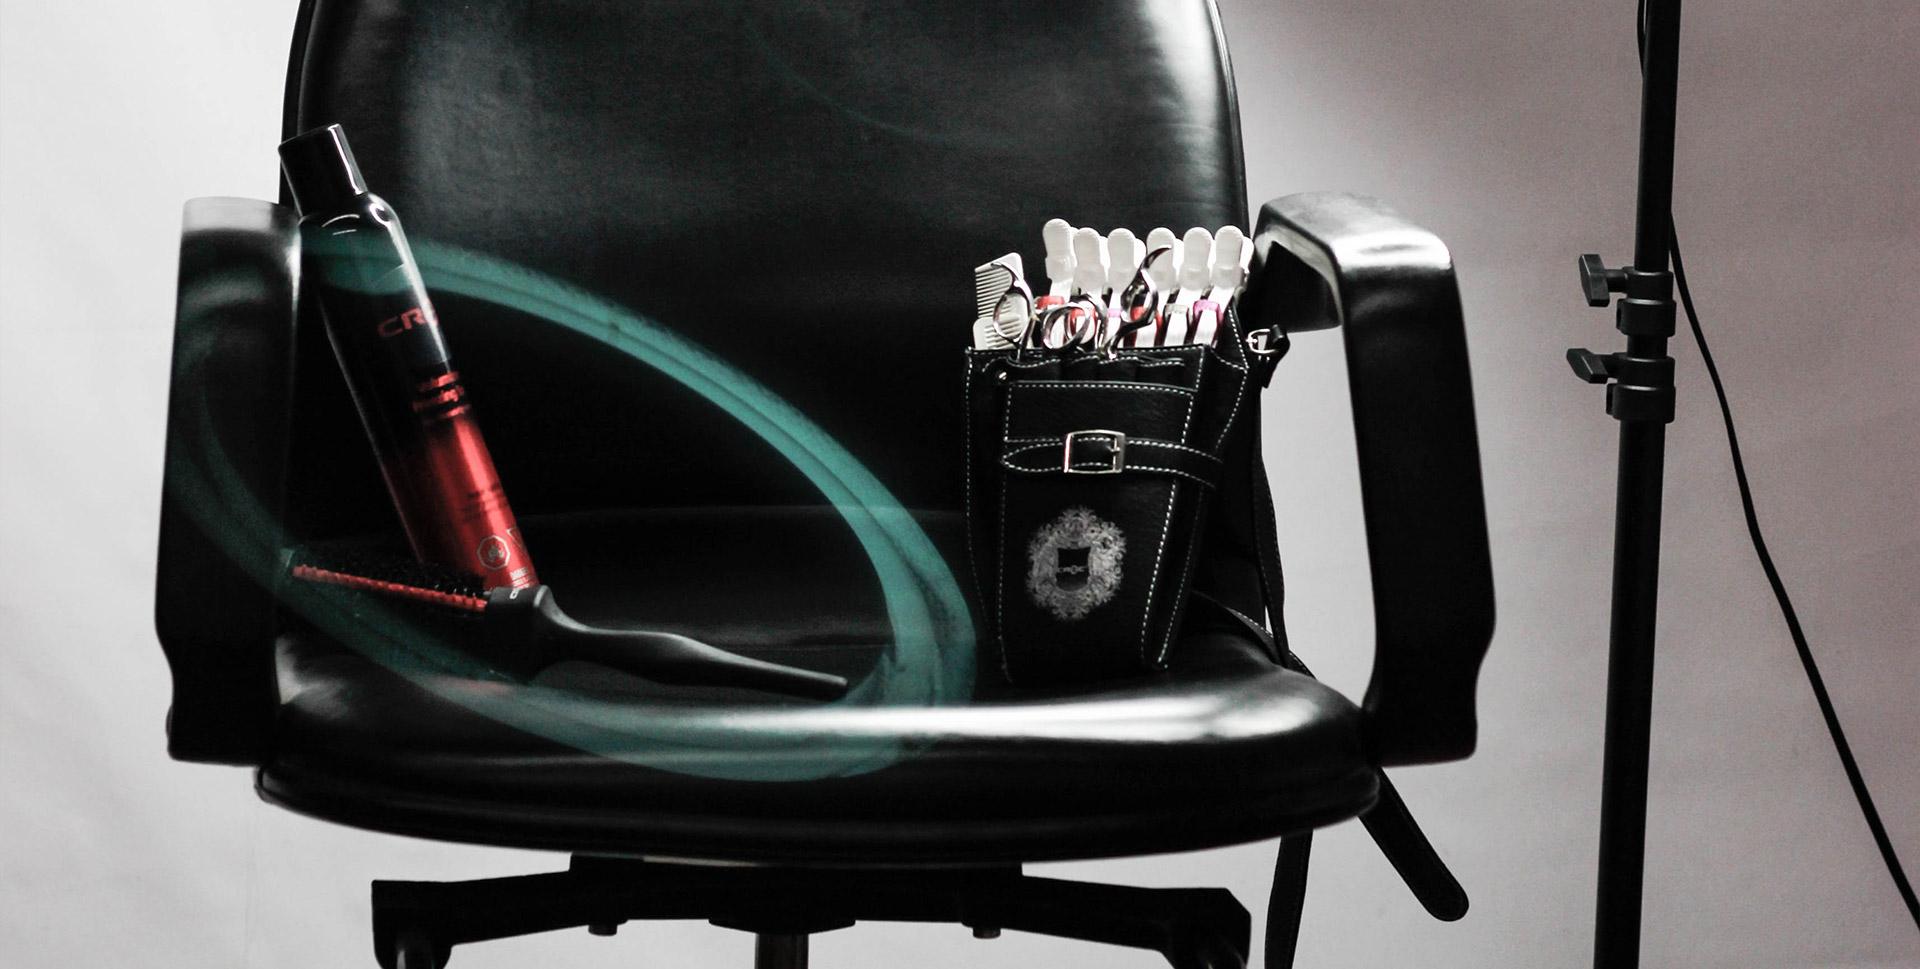 manu camargo 60128 unsplash3 - Home - Australian PMU Supplies | Cosmetic tattoo supplies | PMU equipment australia | cosmetic tattooing machine in australia